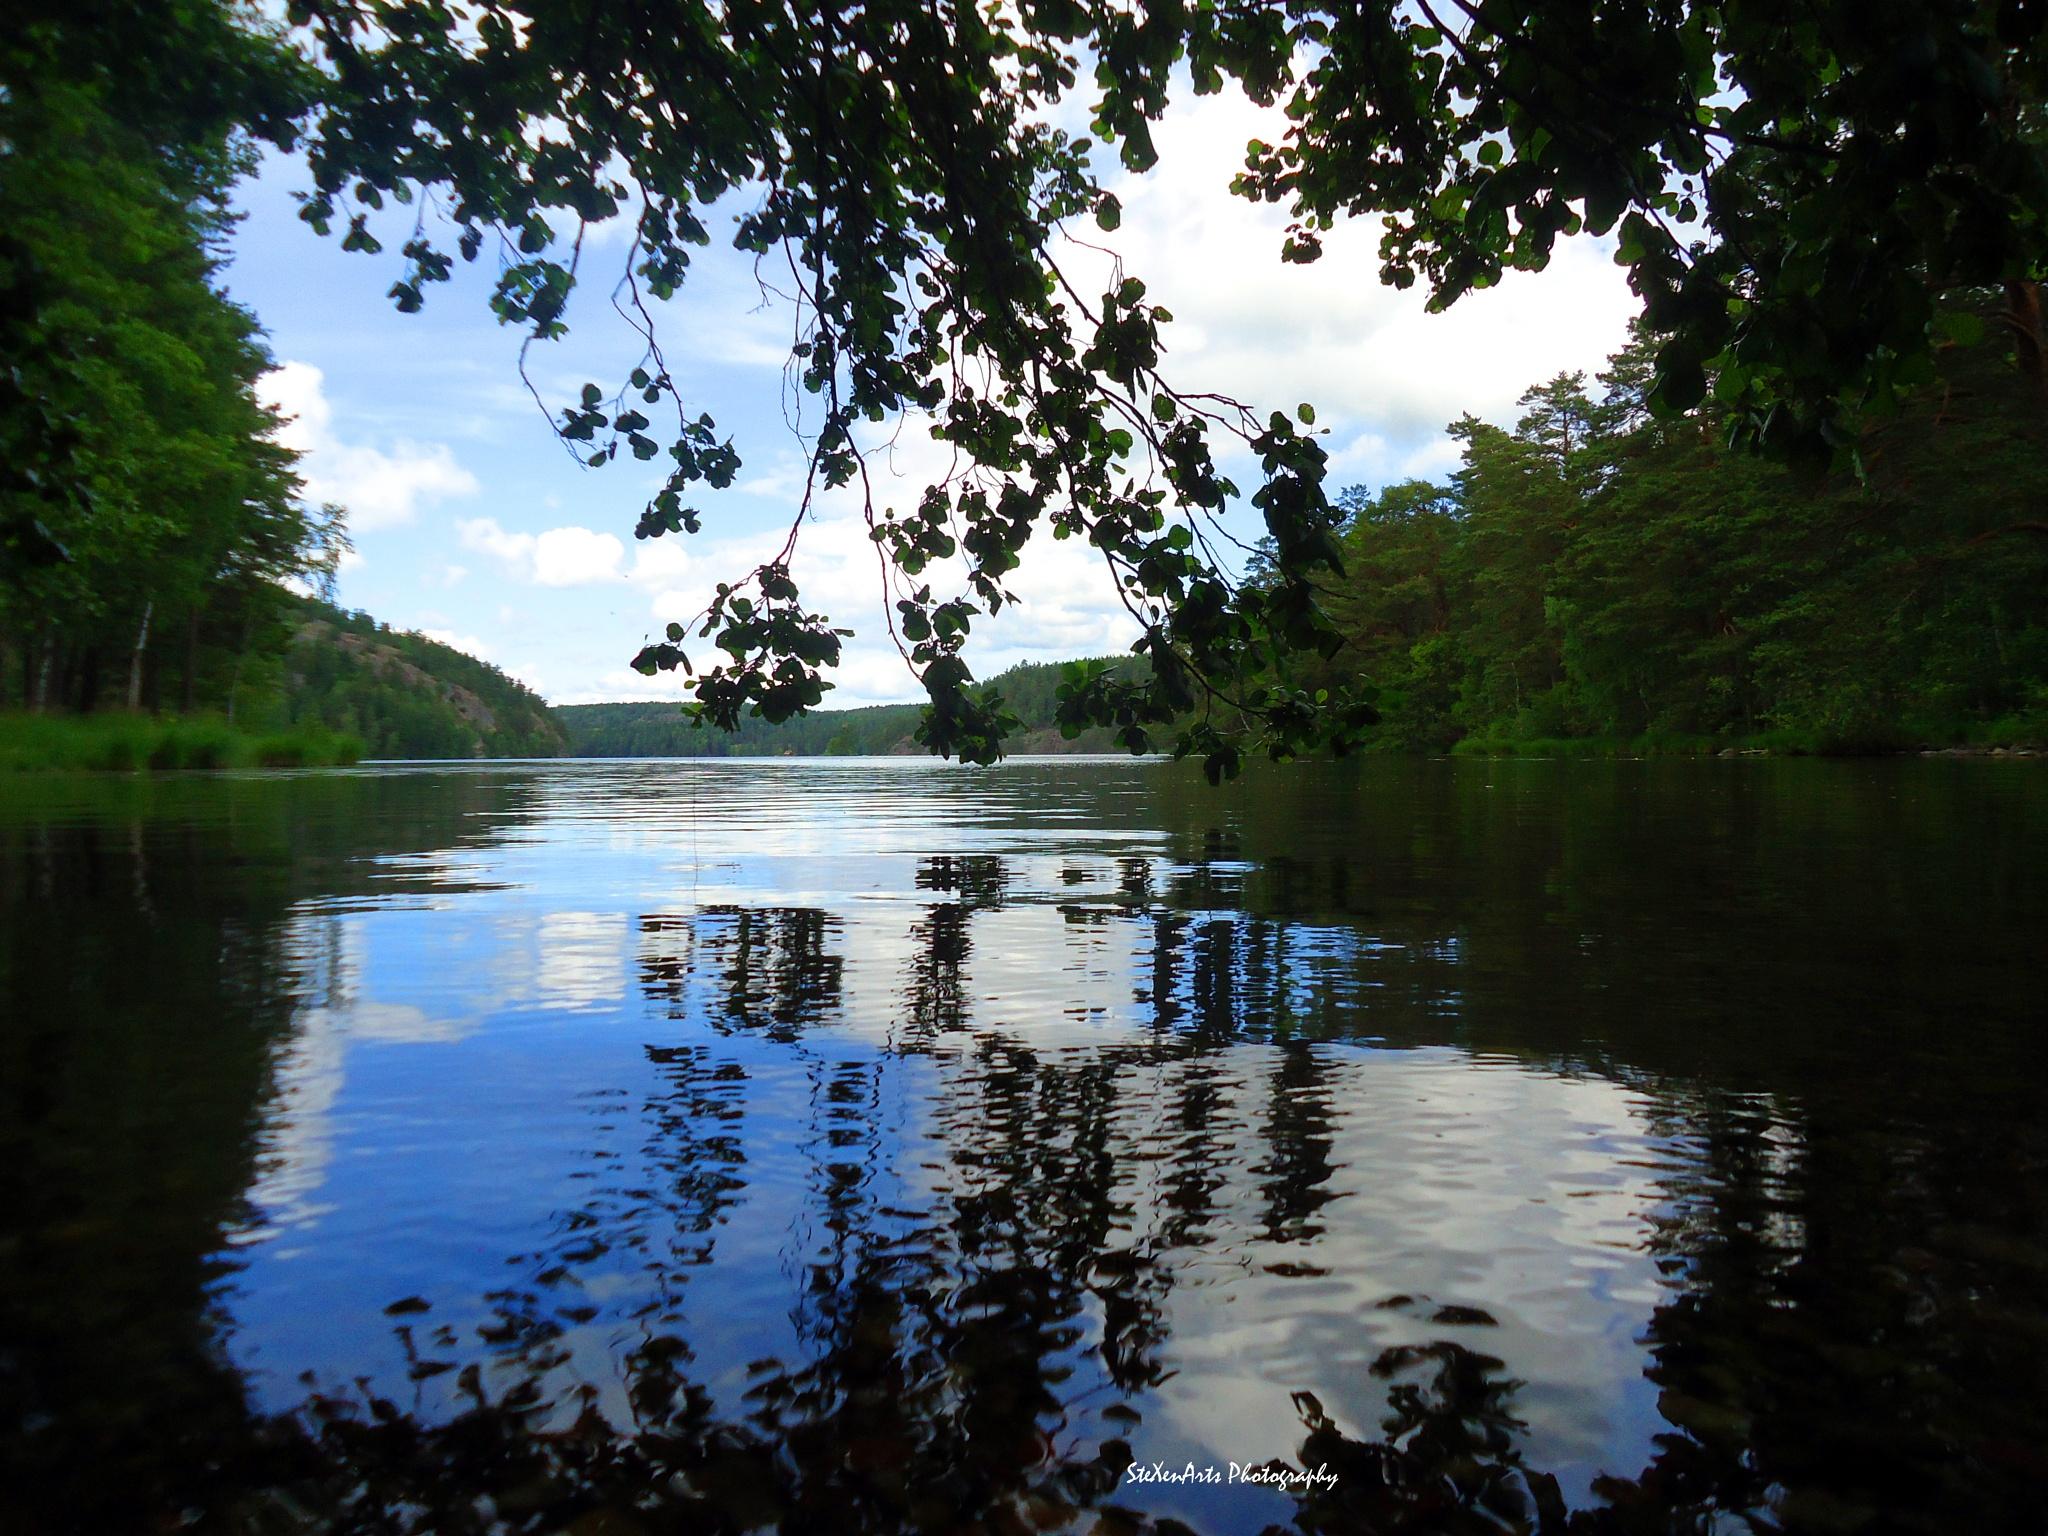 lake reflection by SteXenArts Photography